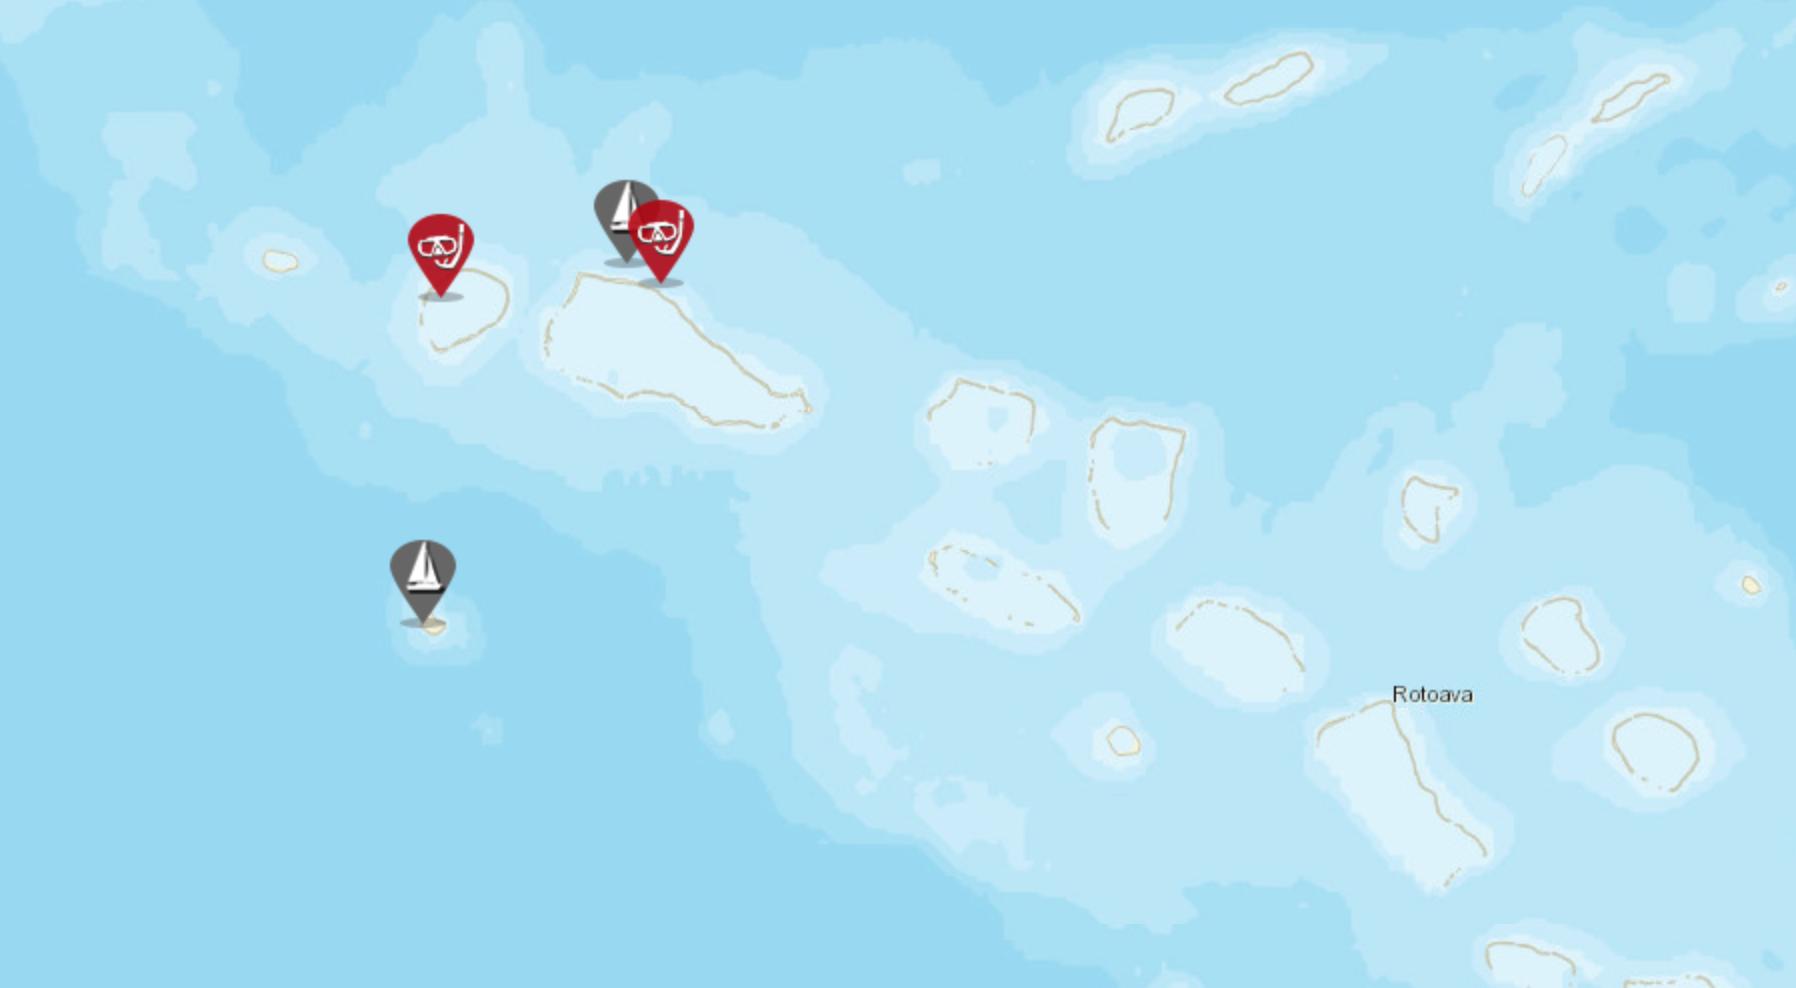 sailing tuamotu map with pins